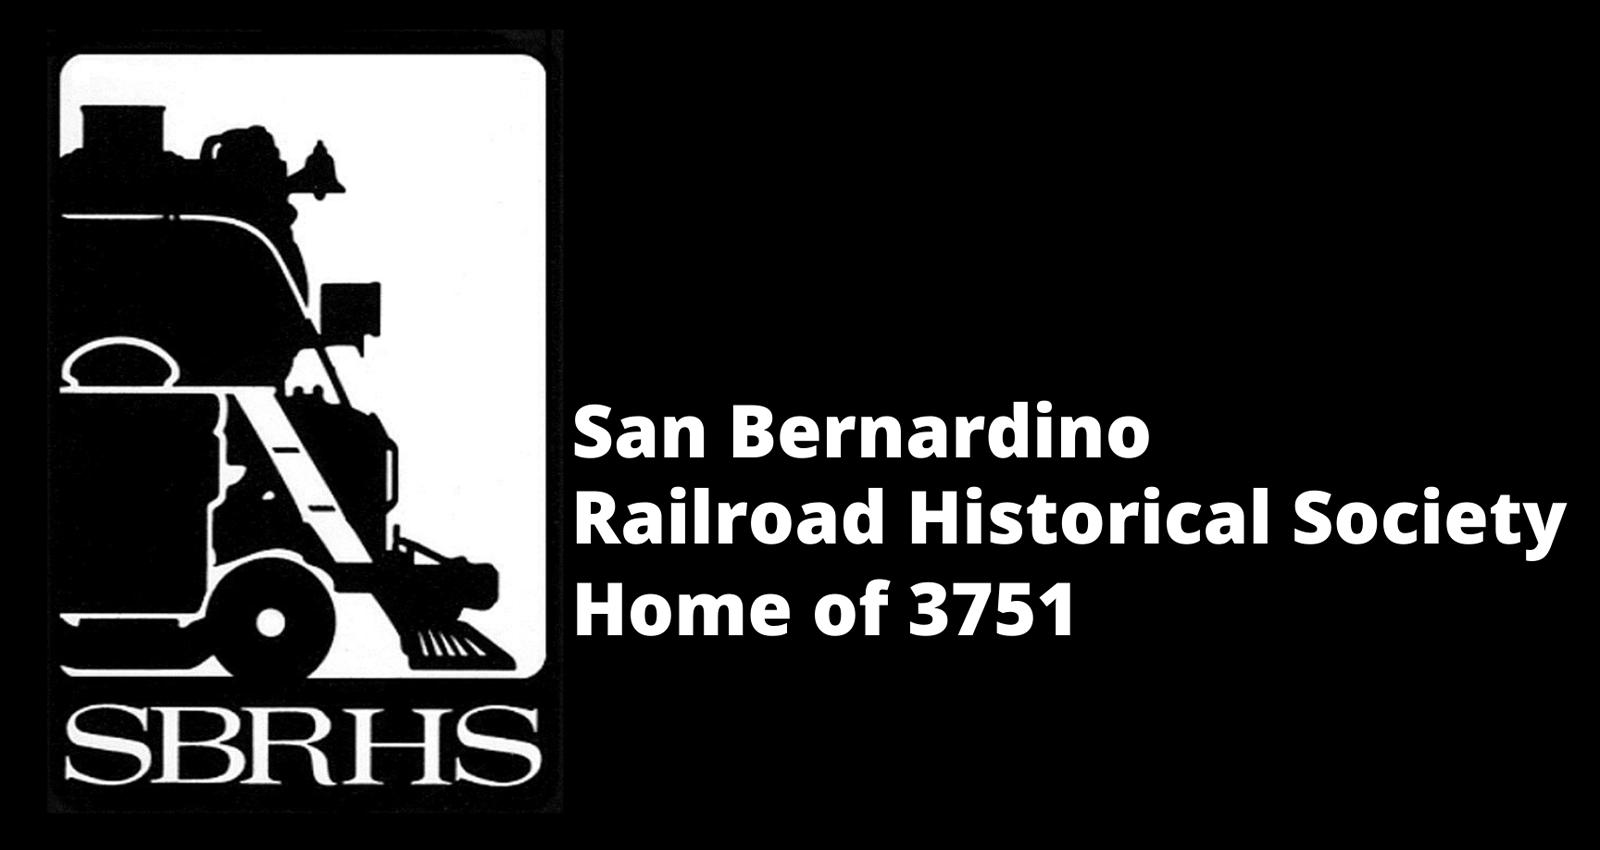 San Bernardino Railroad Historical Society